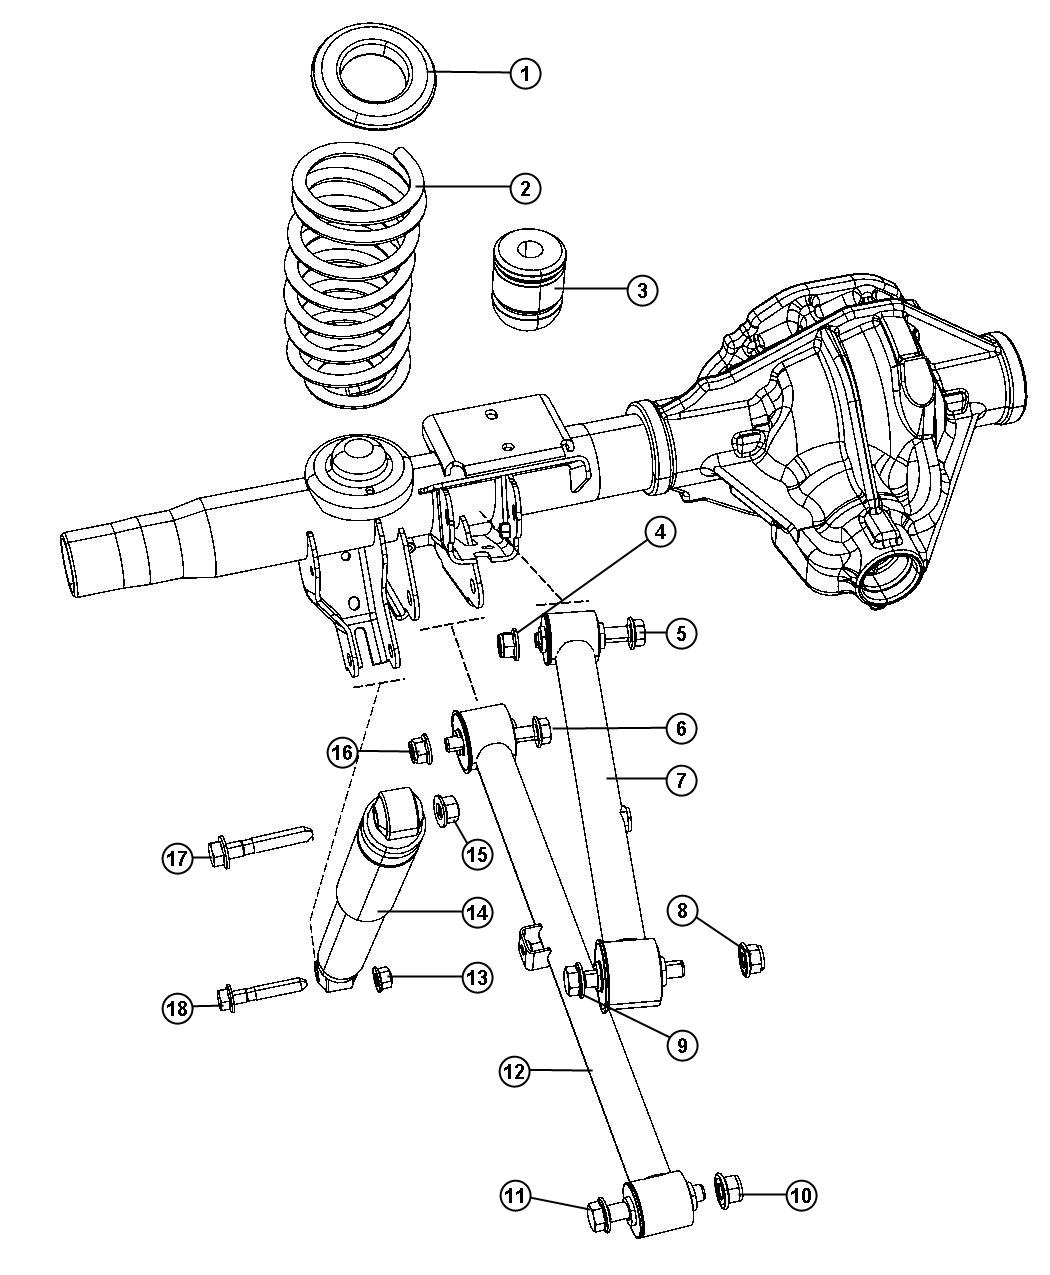 Dodge Ram 1500 Bumper. Jounce. Without [air suspension, 4